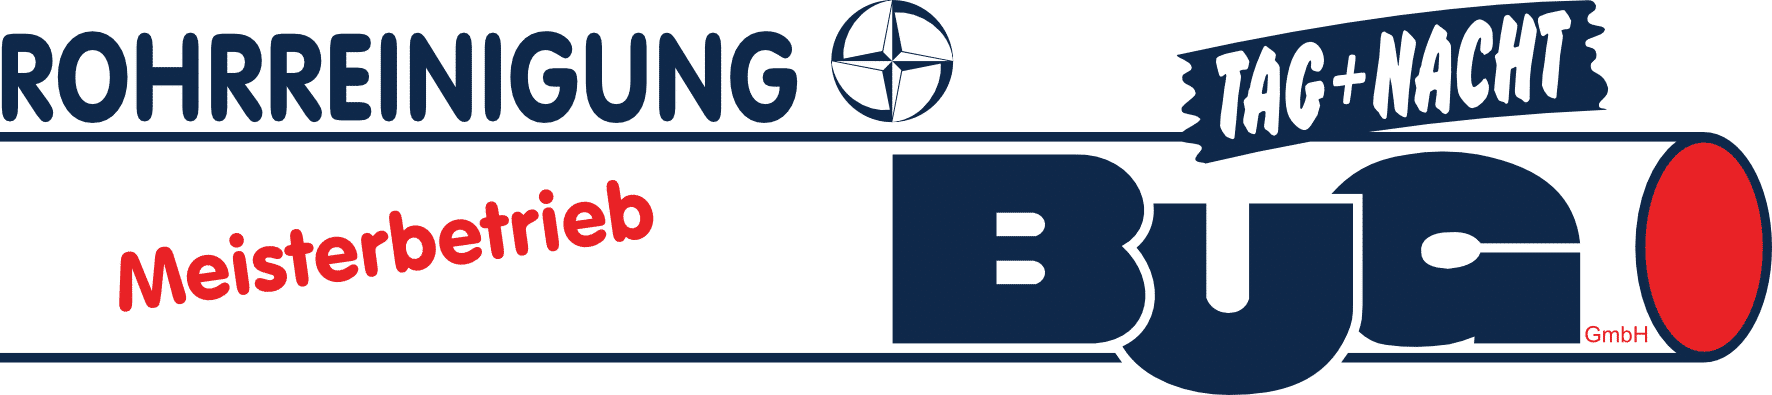 BUG Rohrreinigung GmbH Theodorstr. 18 A-C D - 70469 Stuttgart